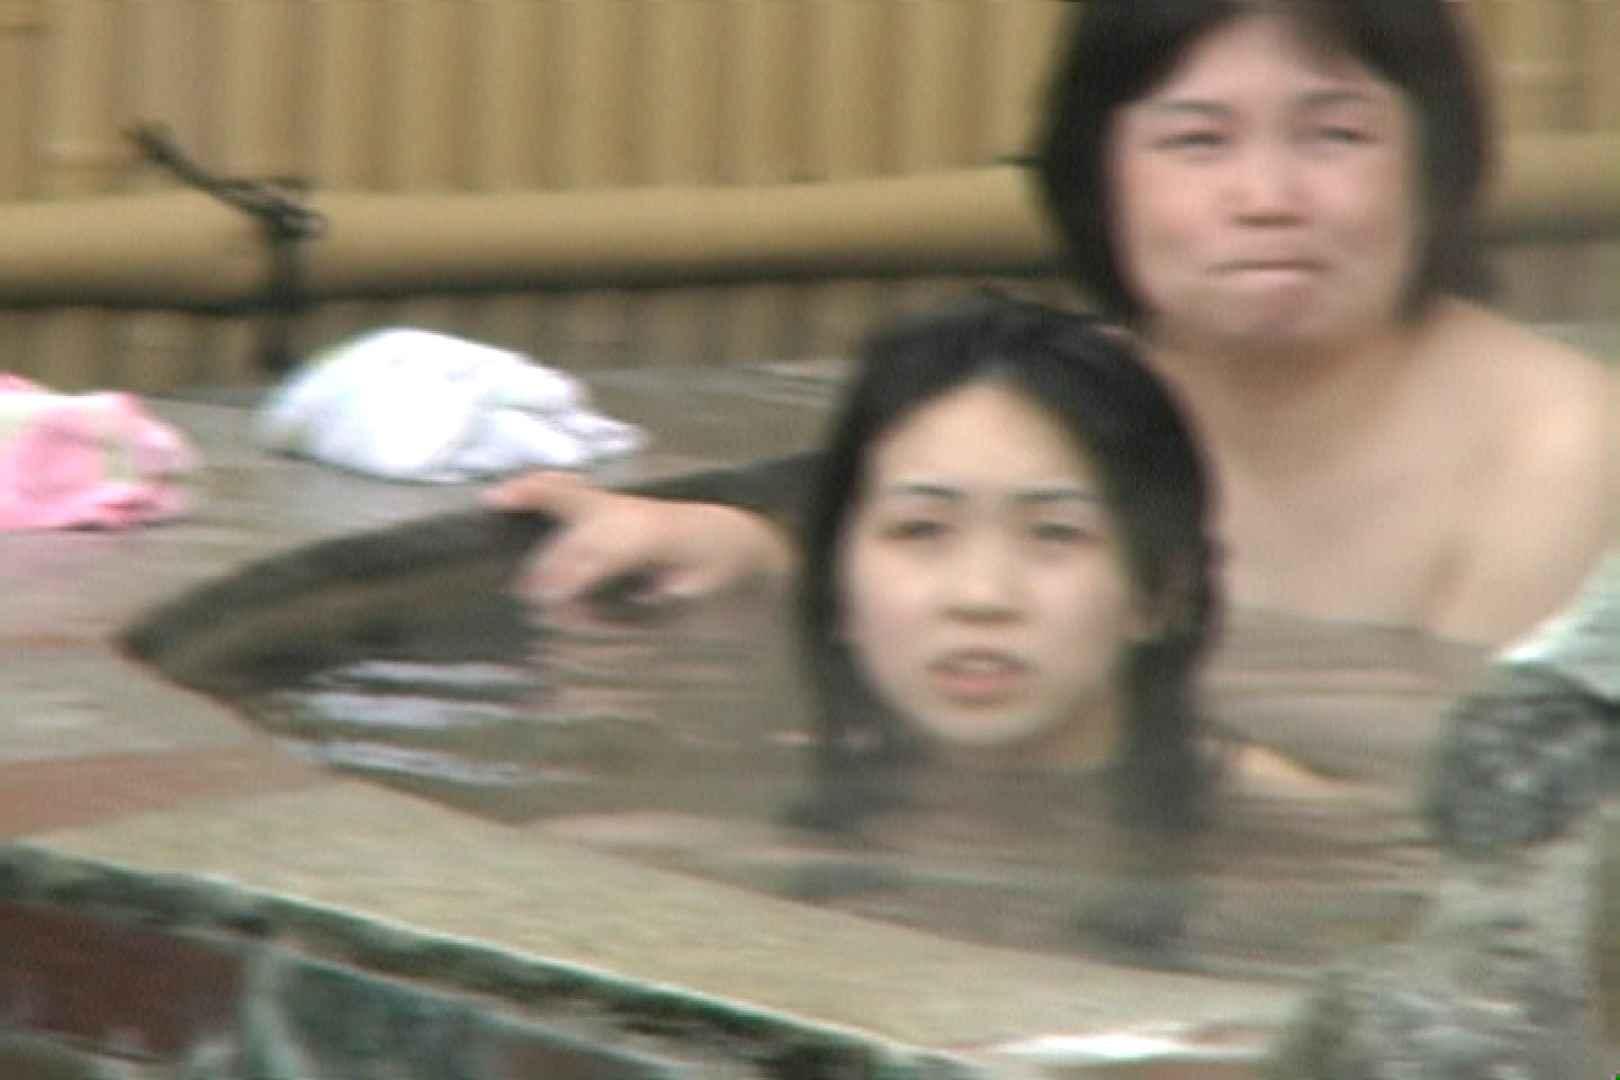 Aquaな露天風呂Vol.646 盗撮映像  26Pix 4